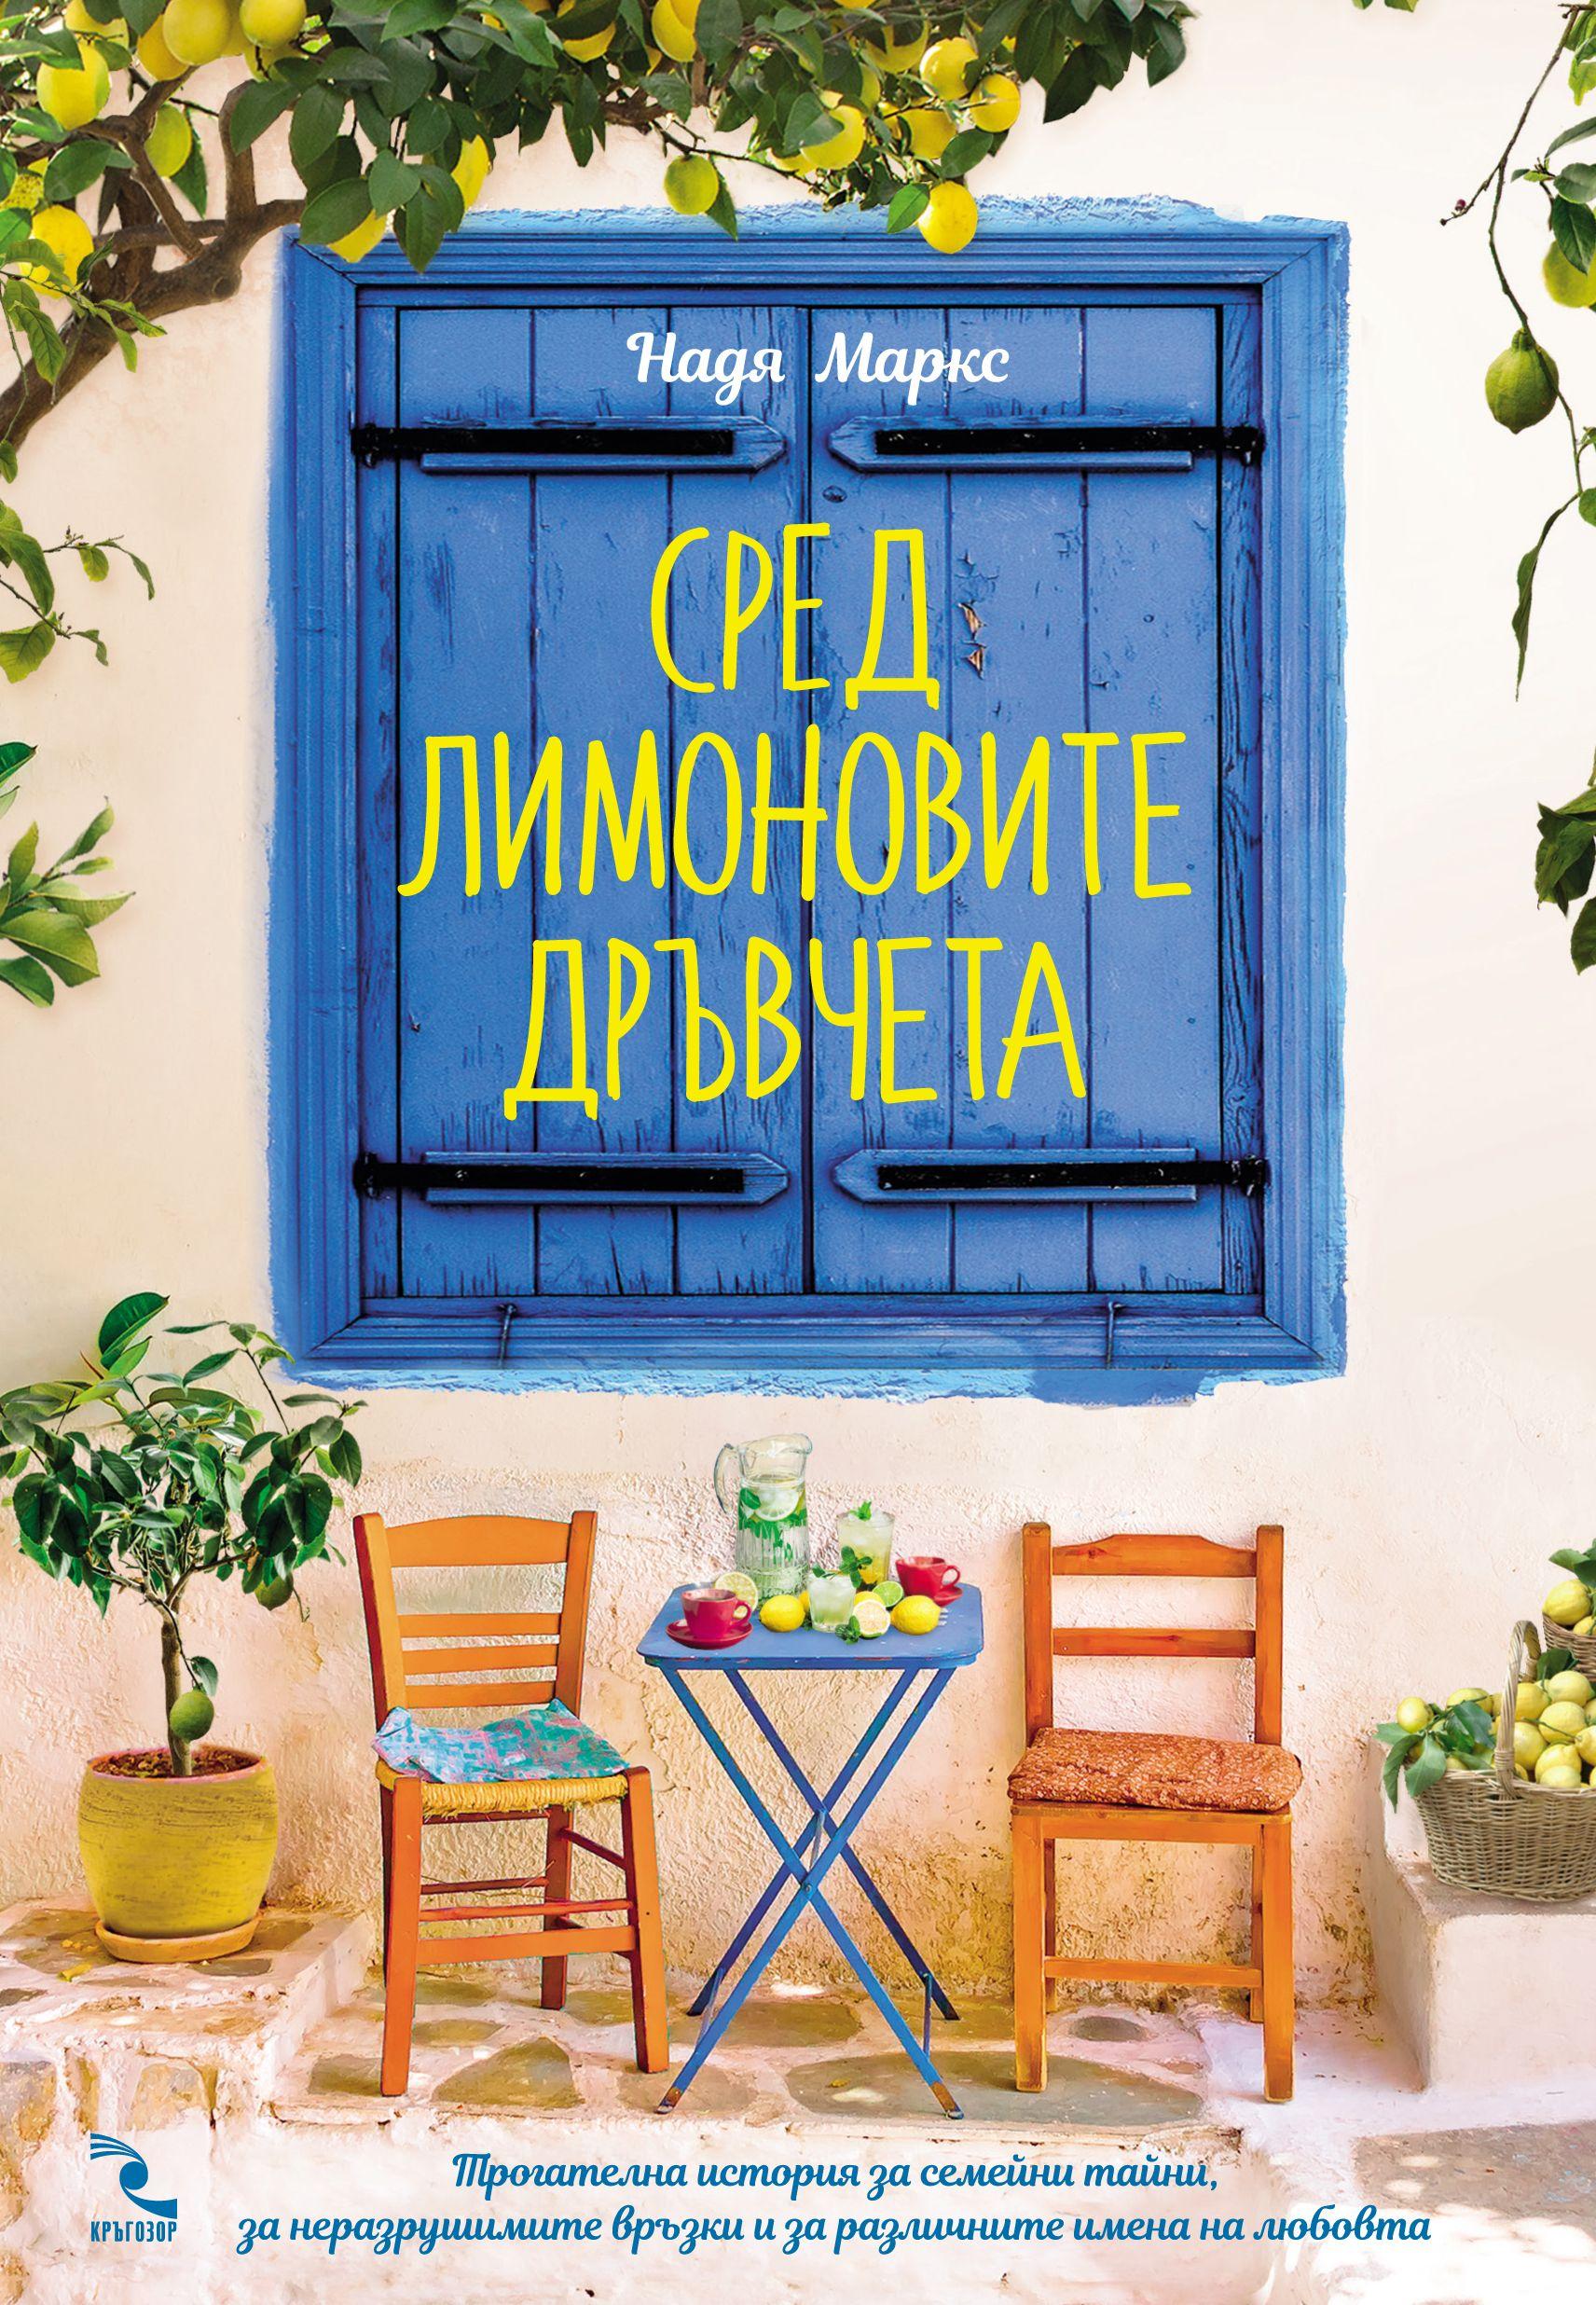 sred-limonenite-darveta - 1